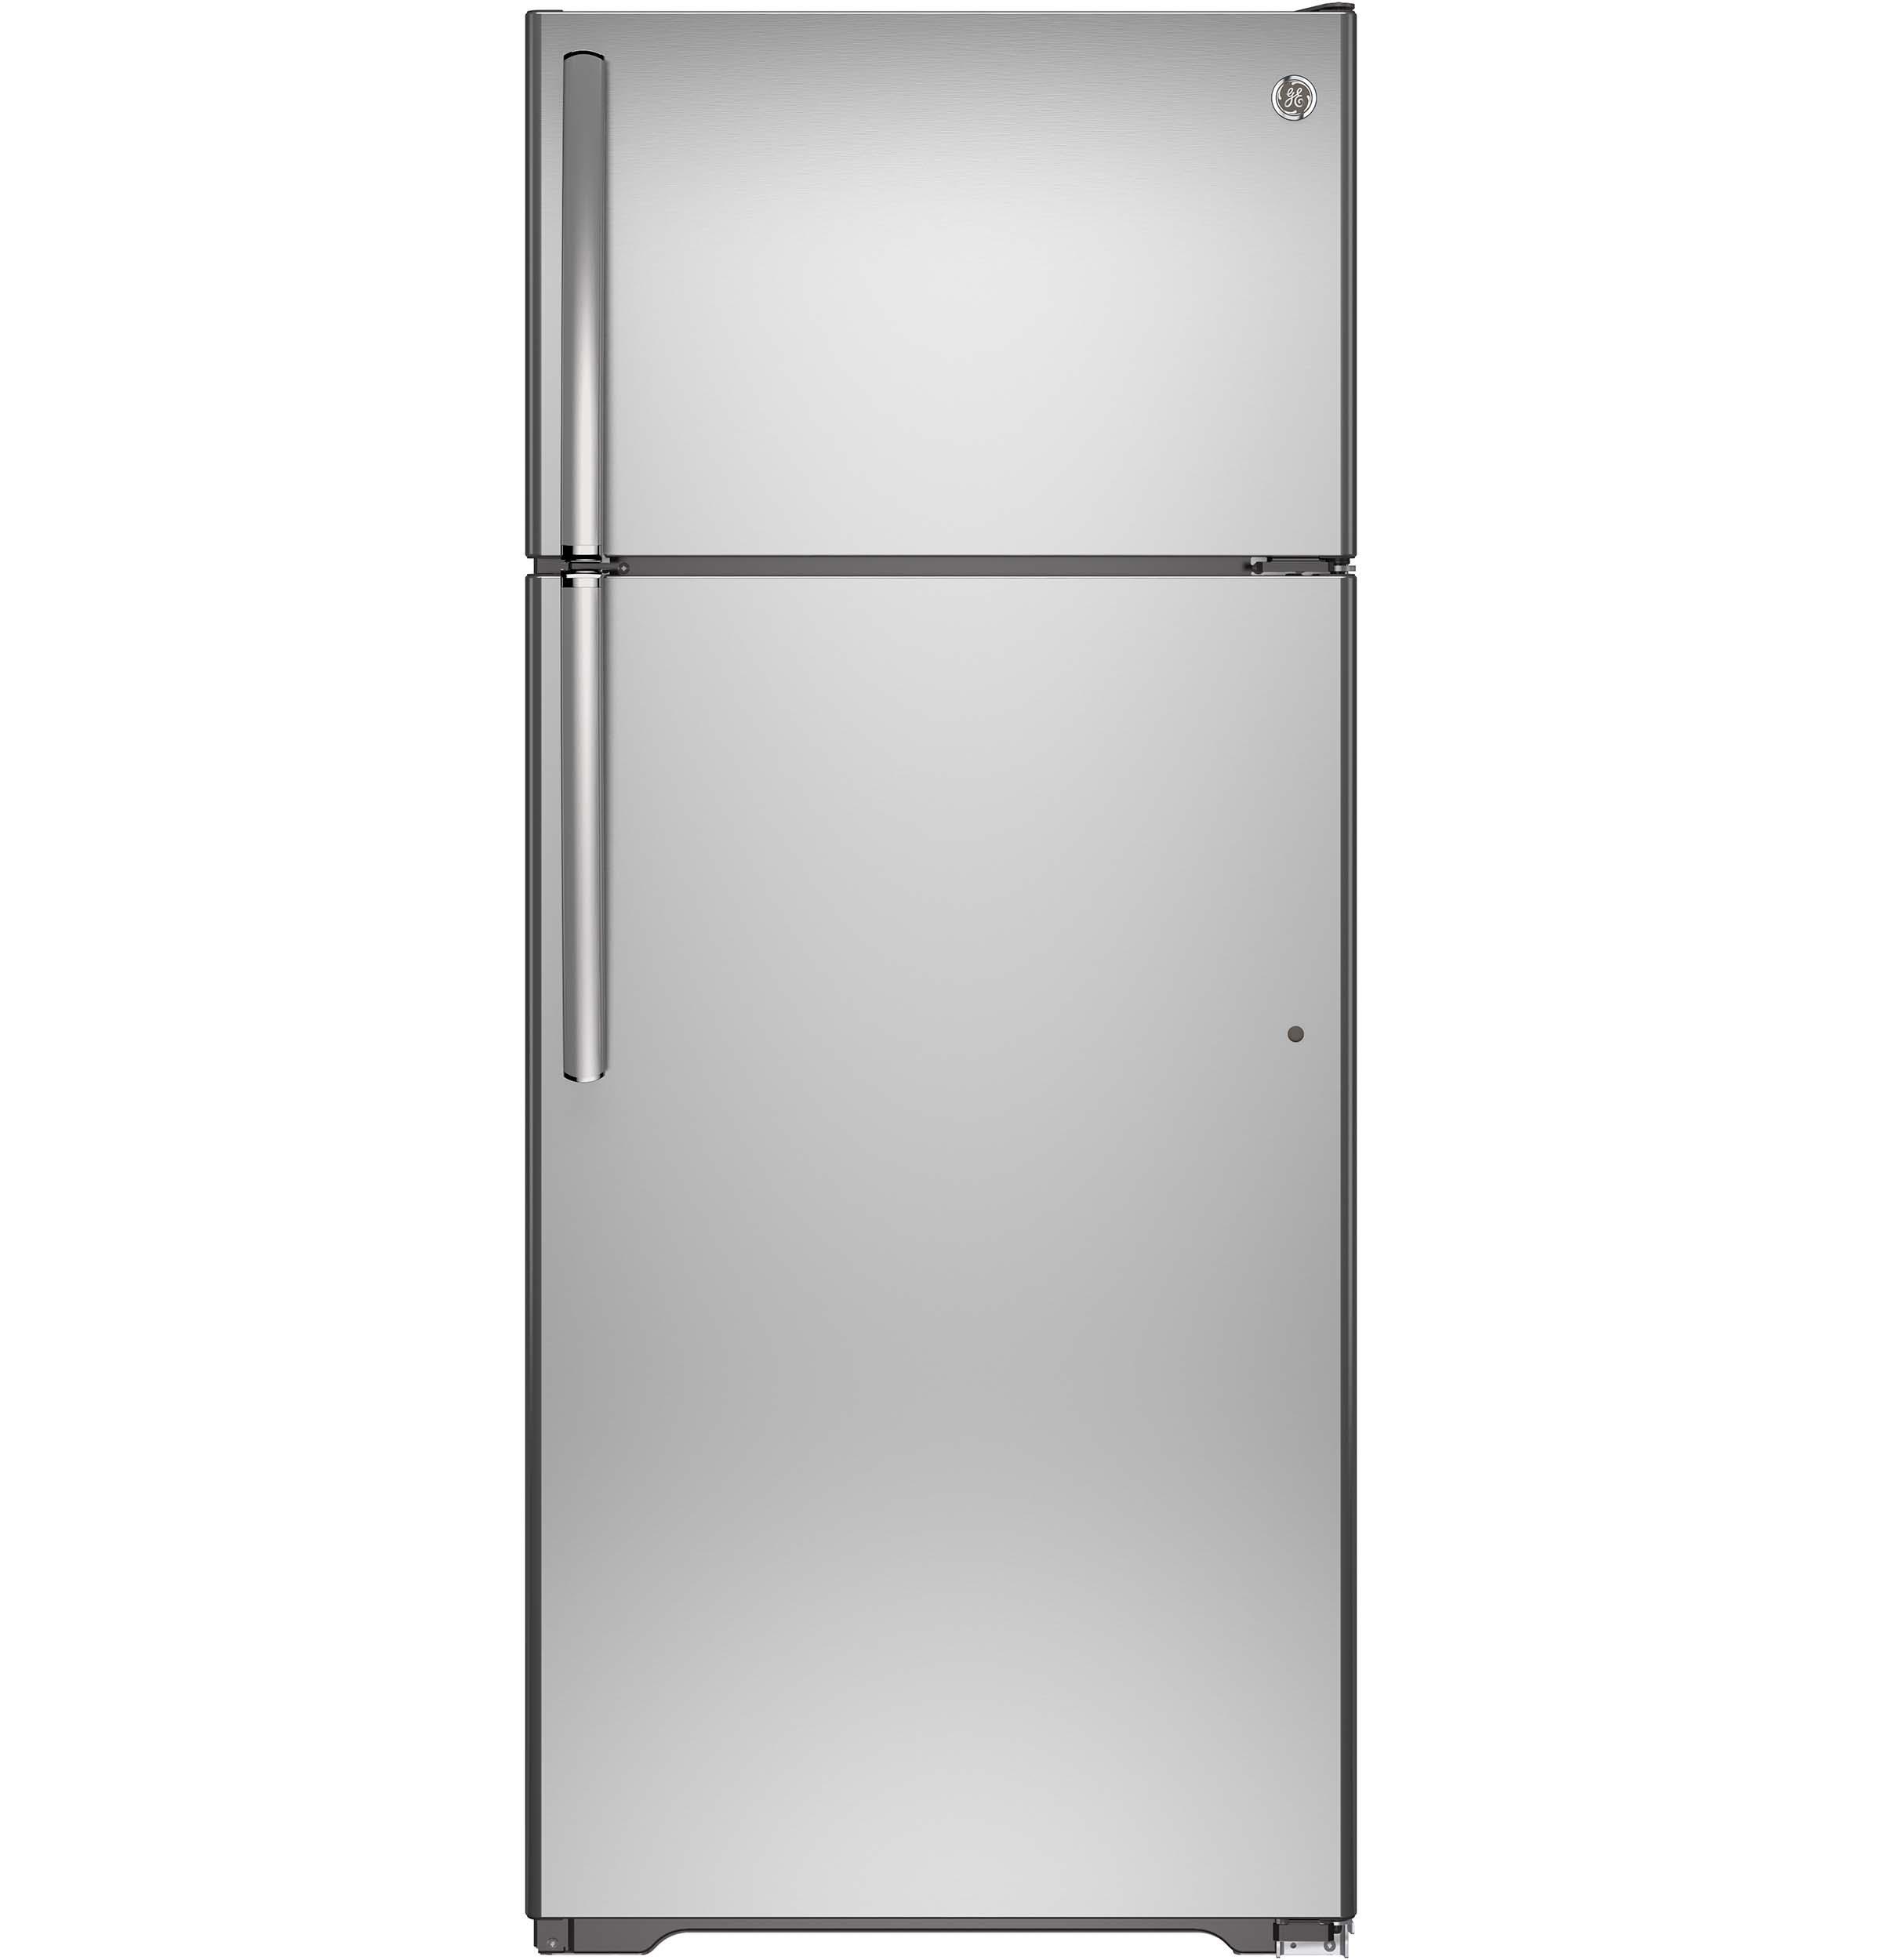 GE(R) ENERGY STAR(R) 17.5 Cu. Ft. Top-Freezer Refrigerator  STAINLESS STEEL